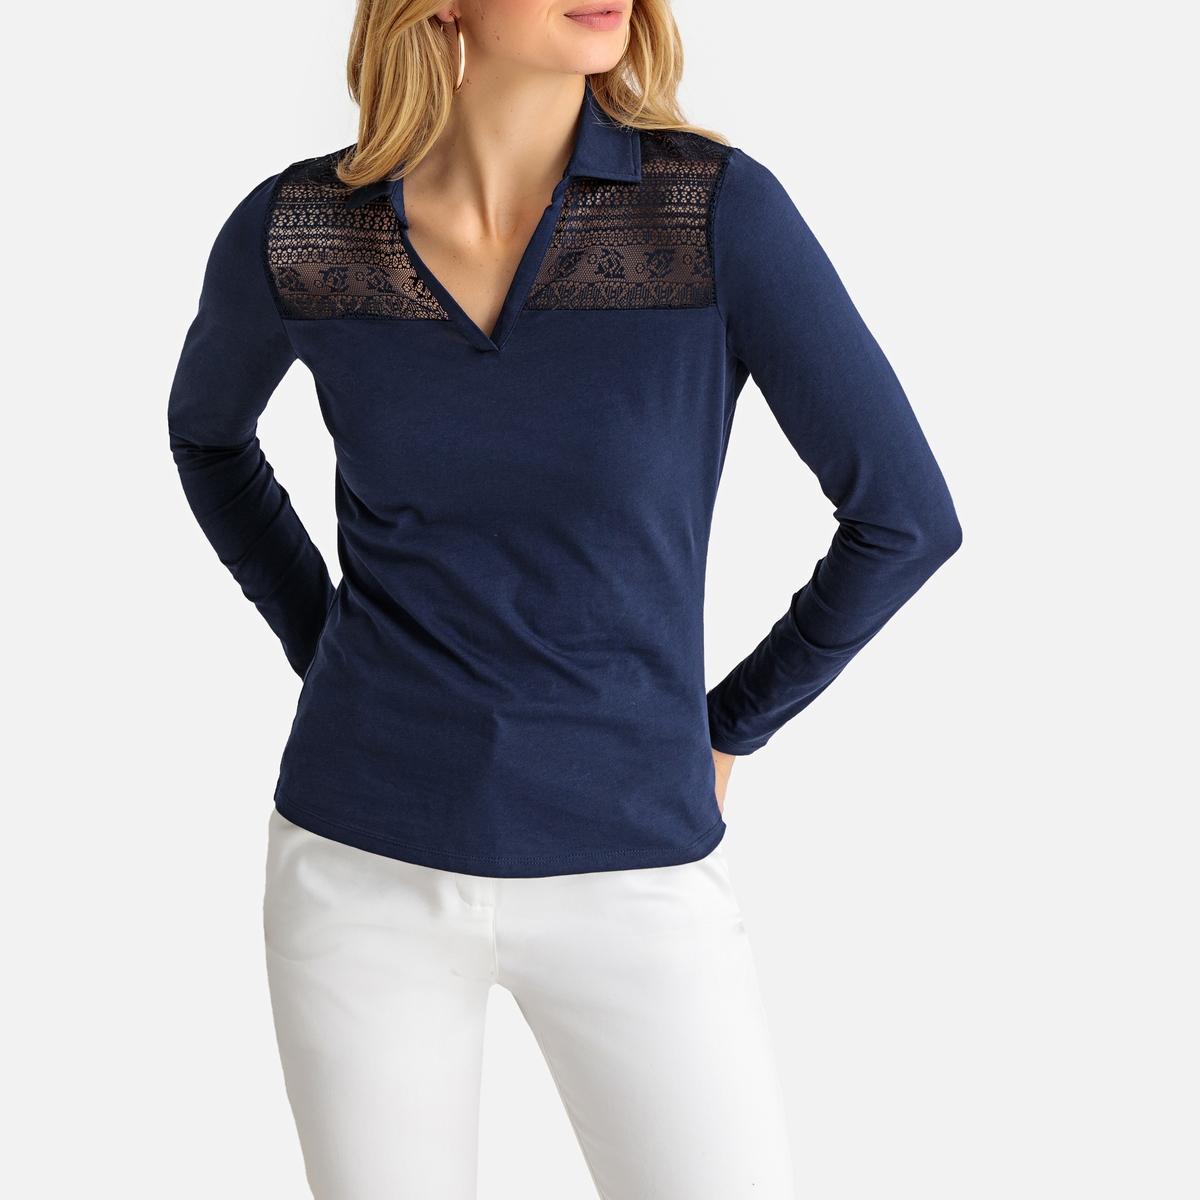 Imagen secundaria de producto de Camiseta de guipur con cuello polo - Anne weyburn